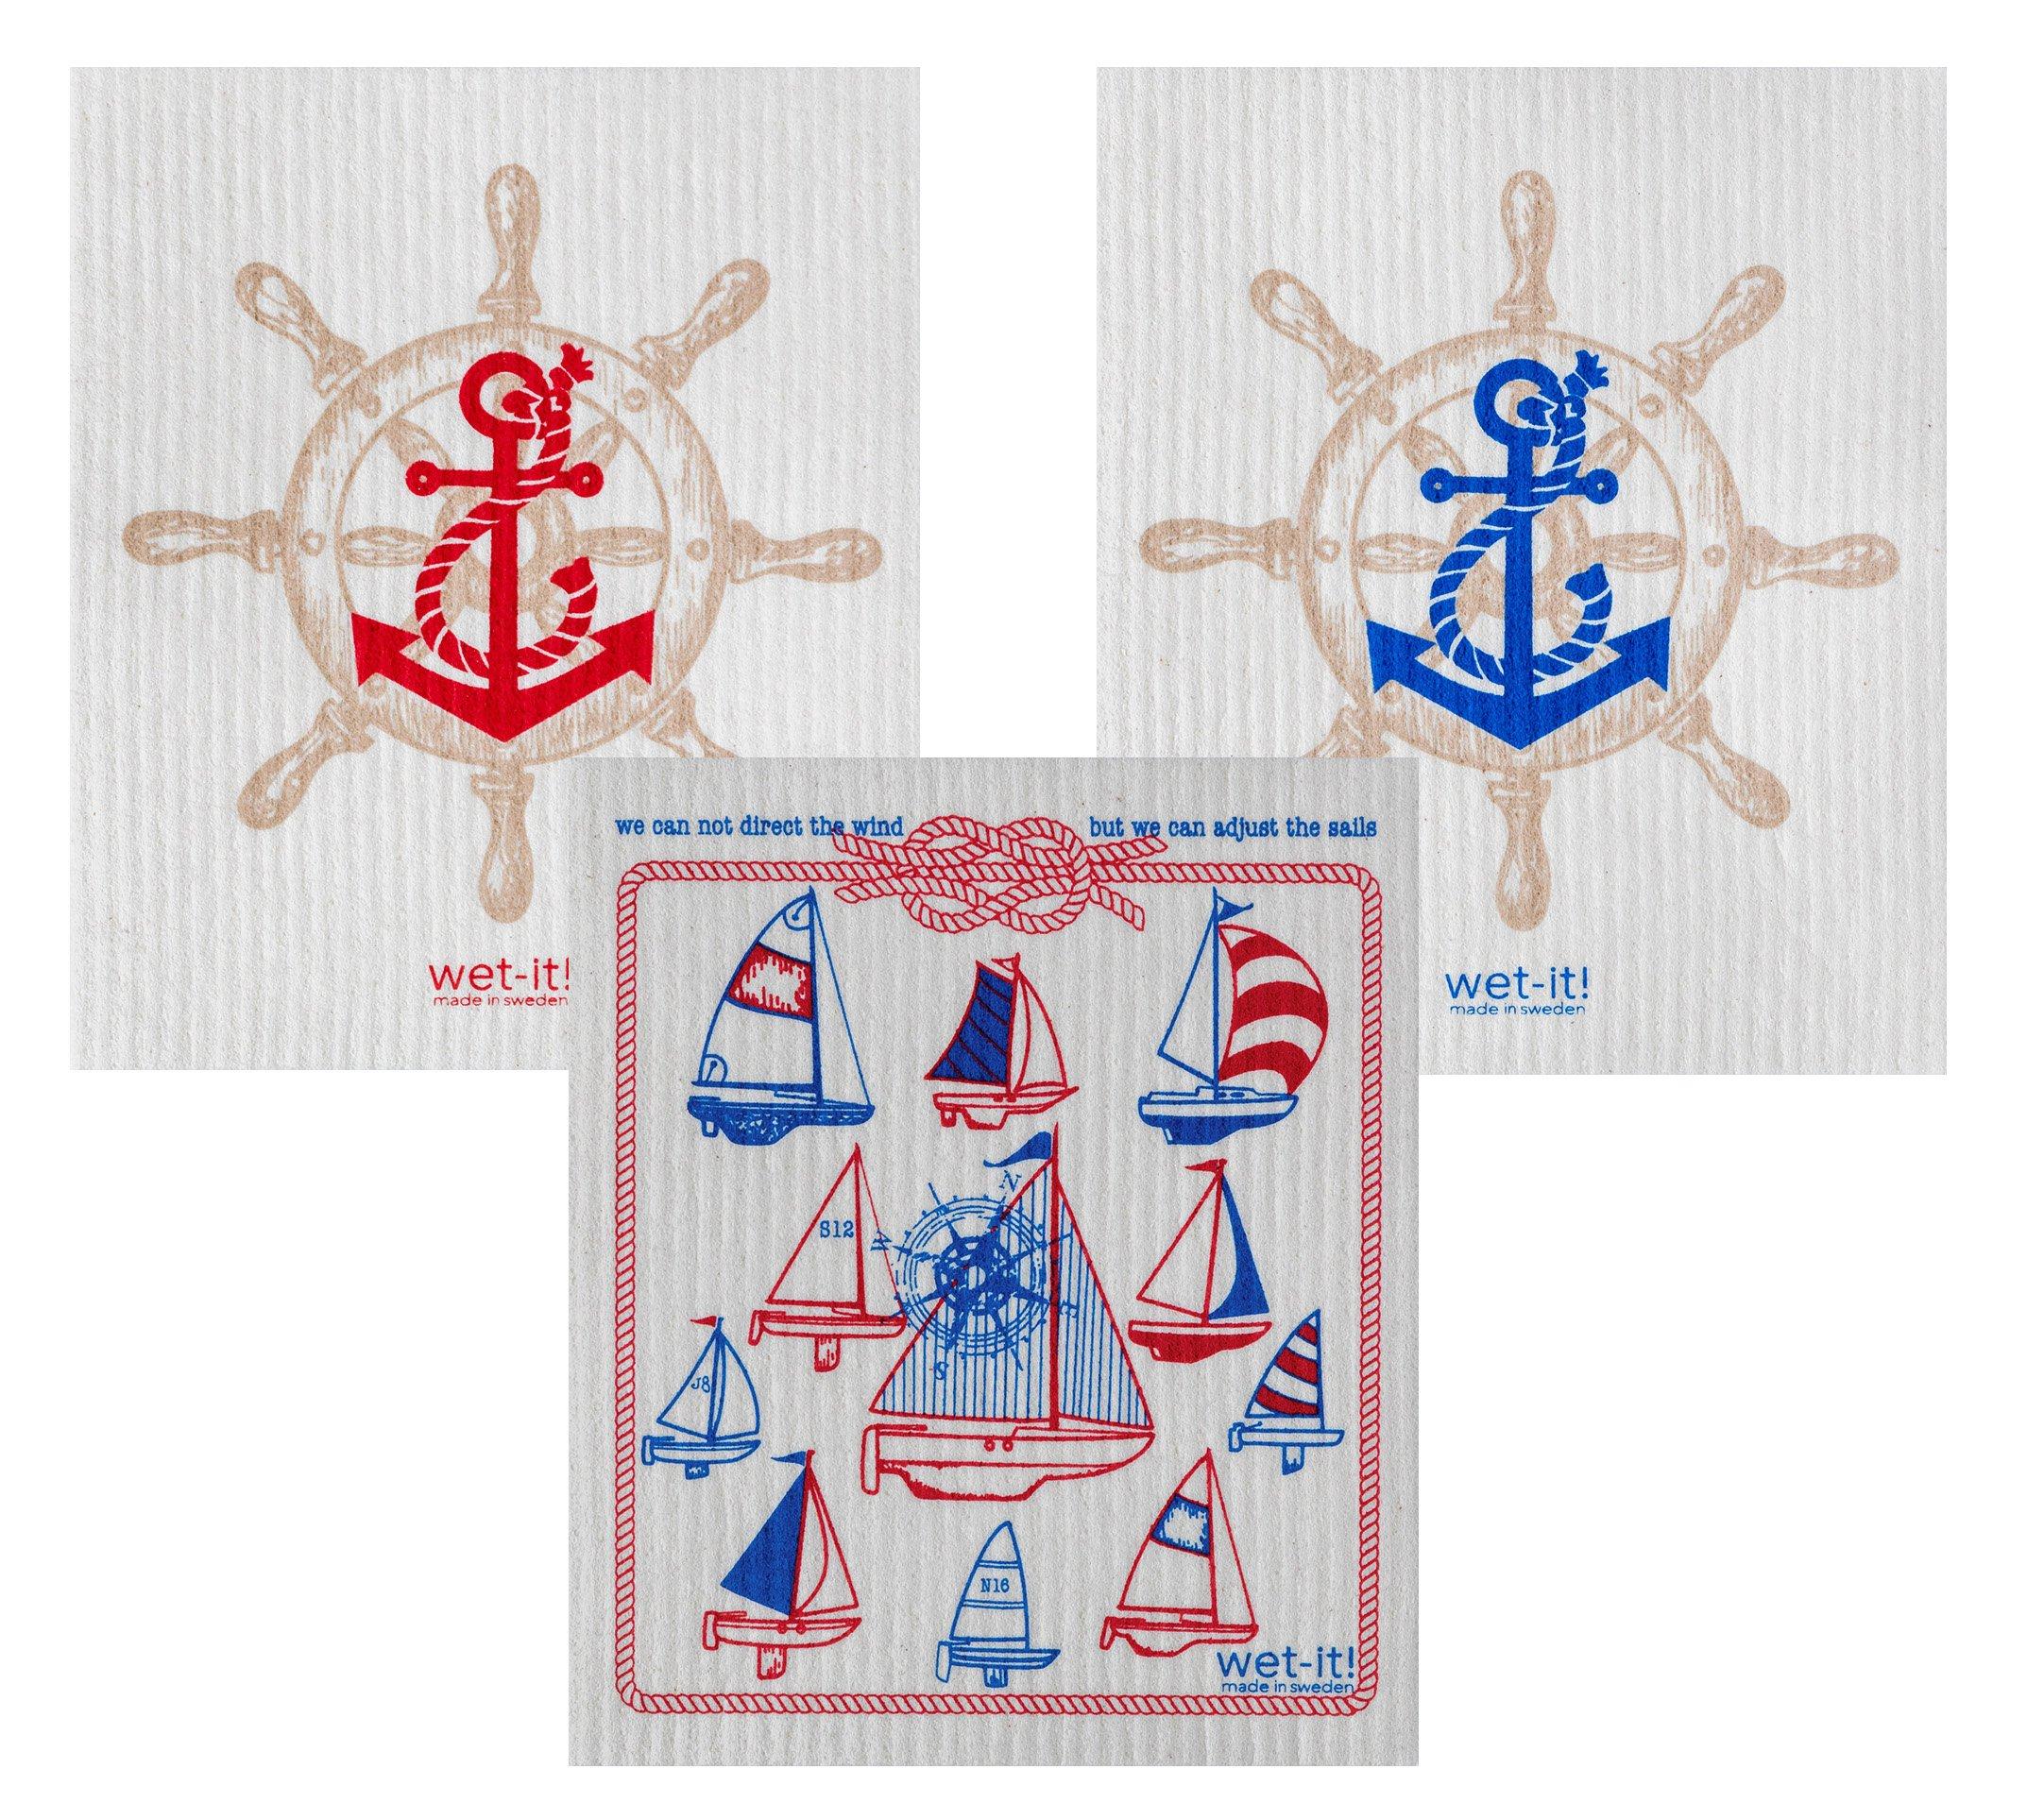 Wet-It Swedish Dishcloth Set of 3 (Sailing Red and Navy)